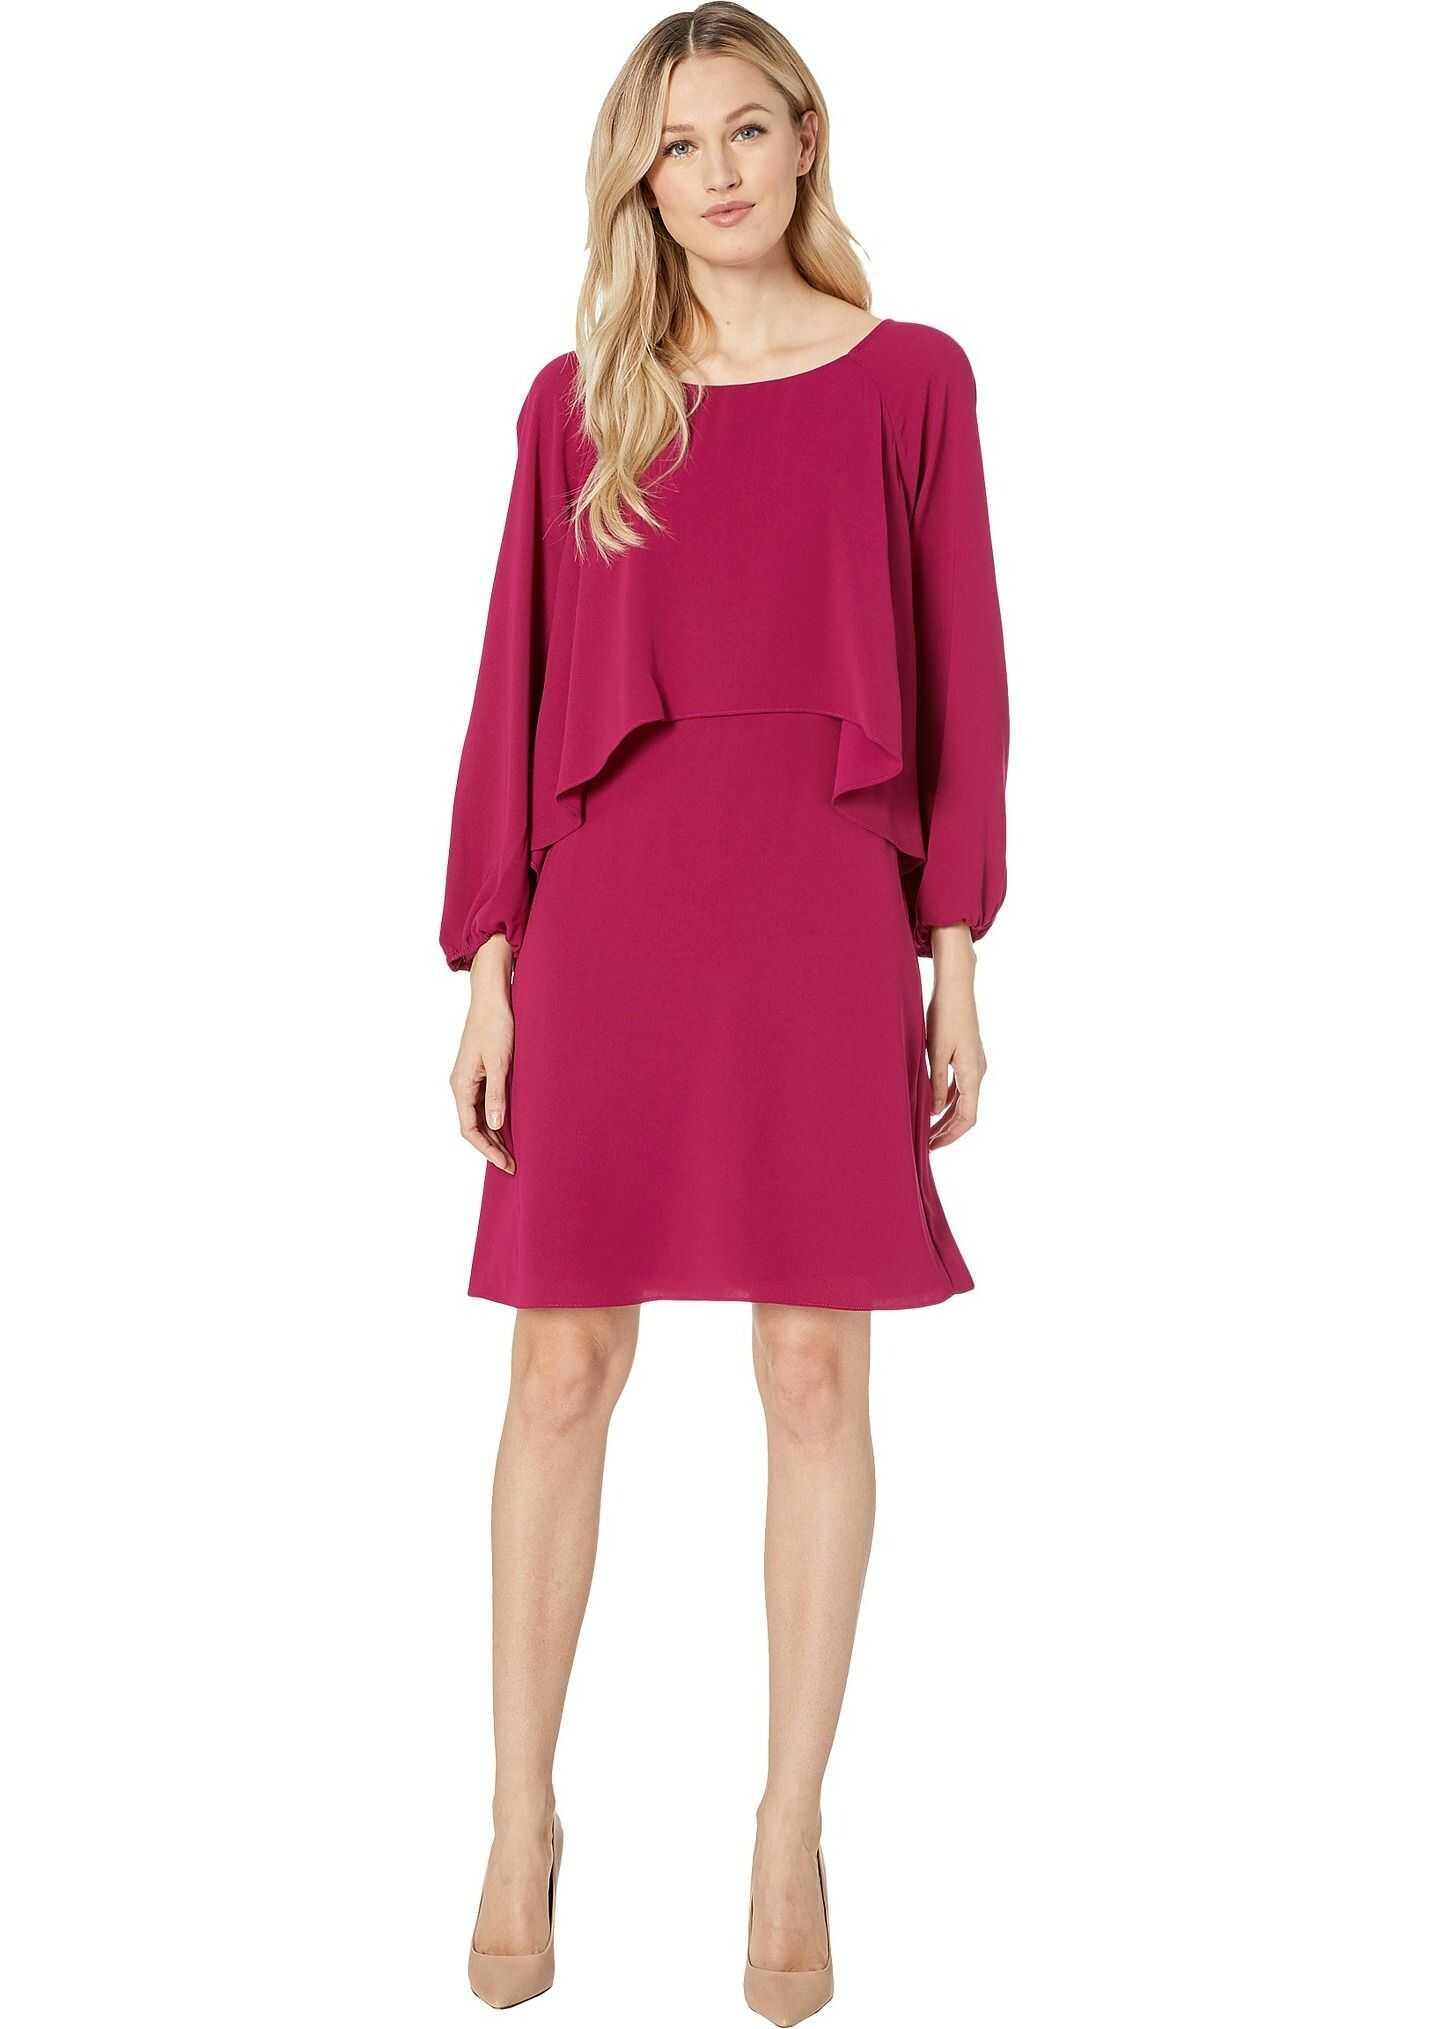 Adrianna Papell Fancy Crepe Cascading Popover Dress Berry Gem